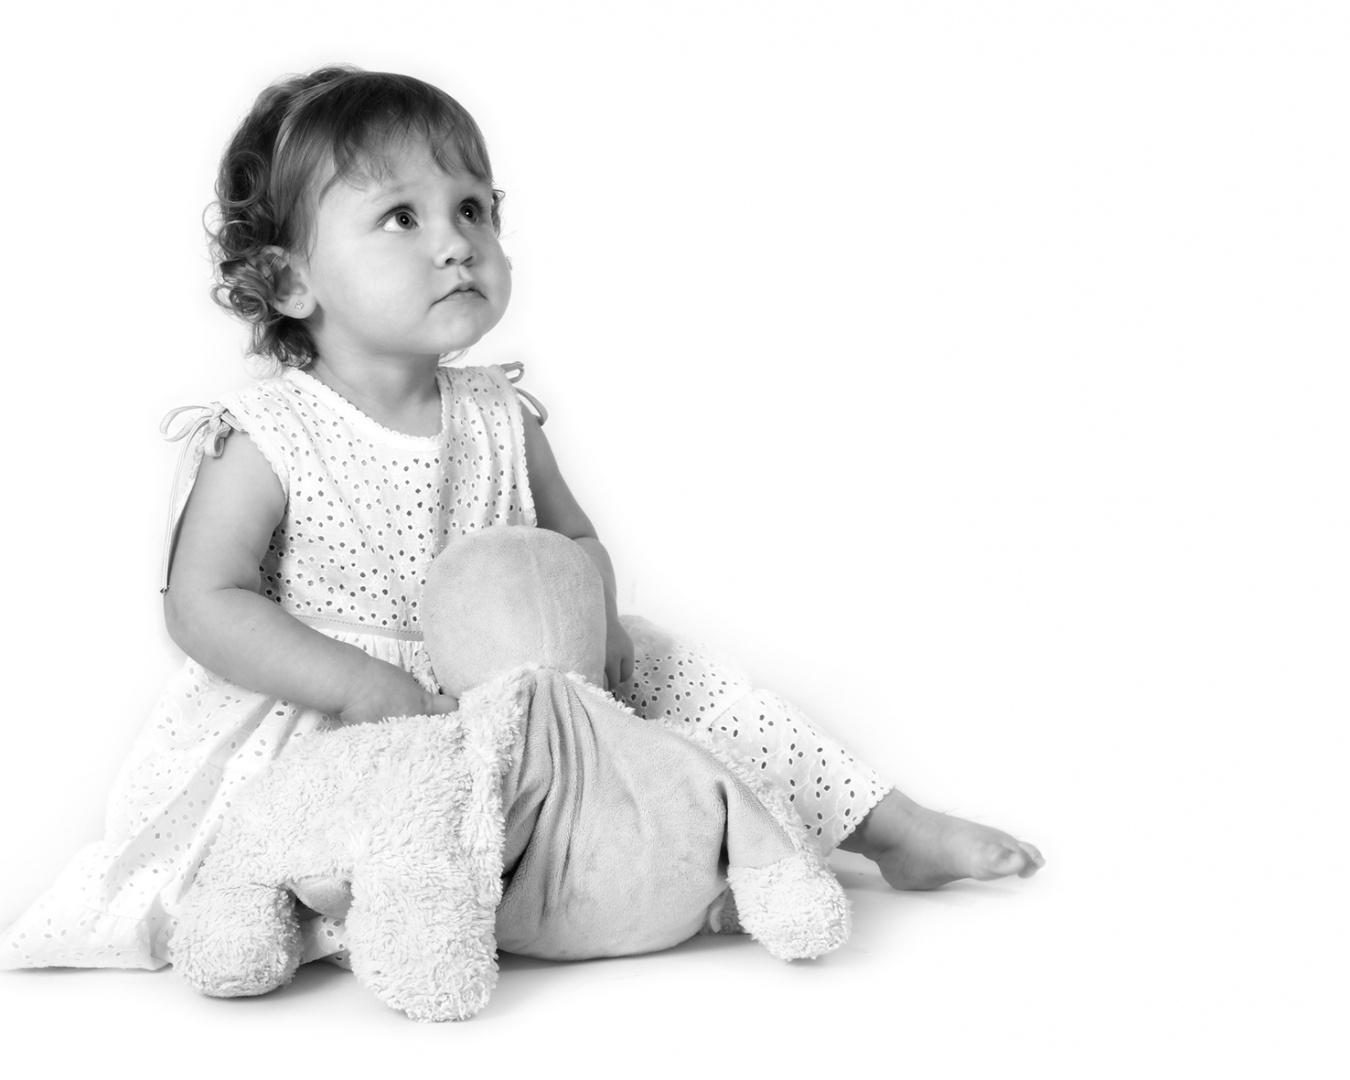 Bebés, niños y Familias - Bebés, niños y Familias